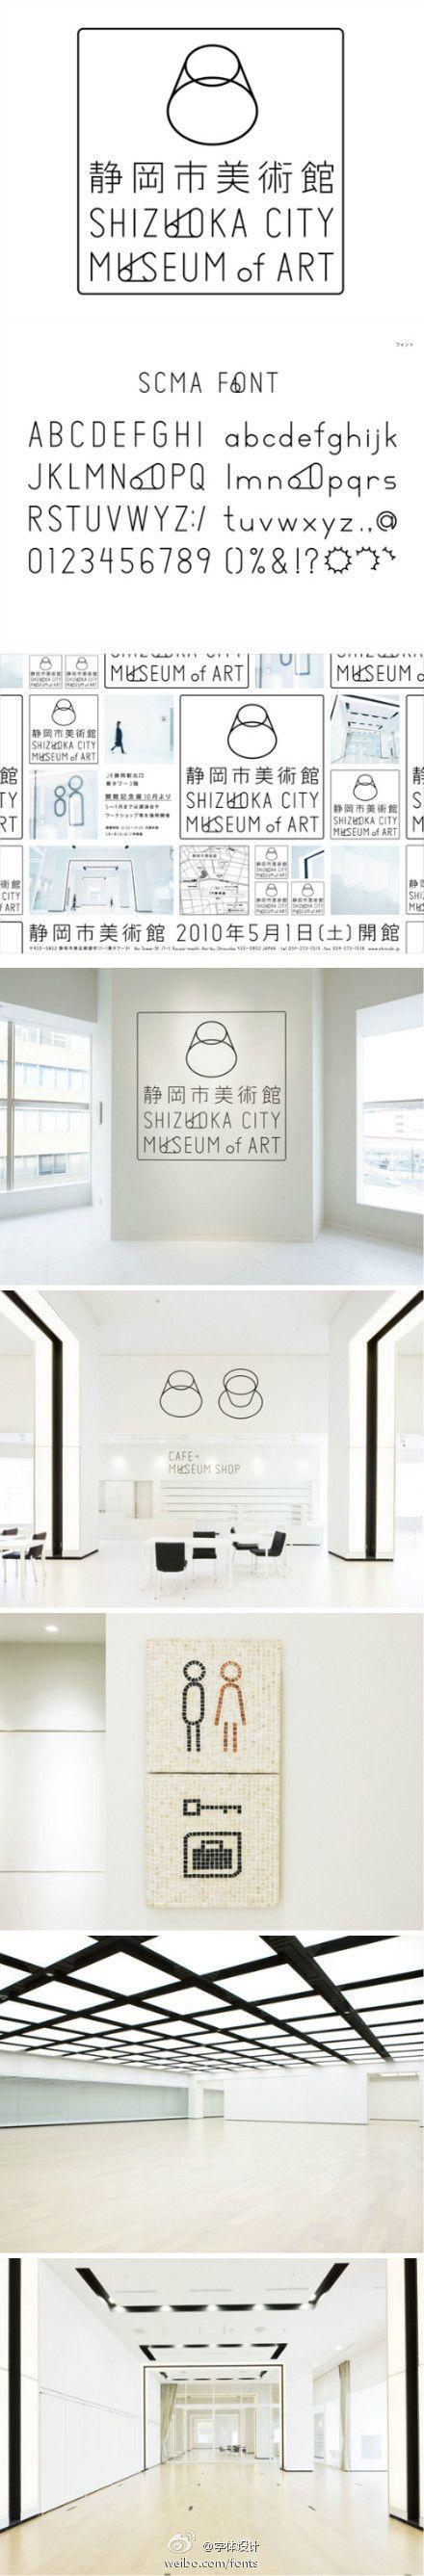 静岡市美術館 by Masahiro Kakinokihara